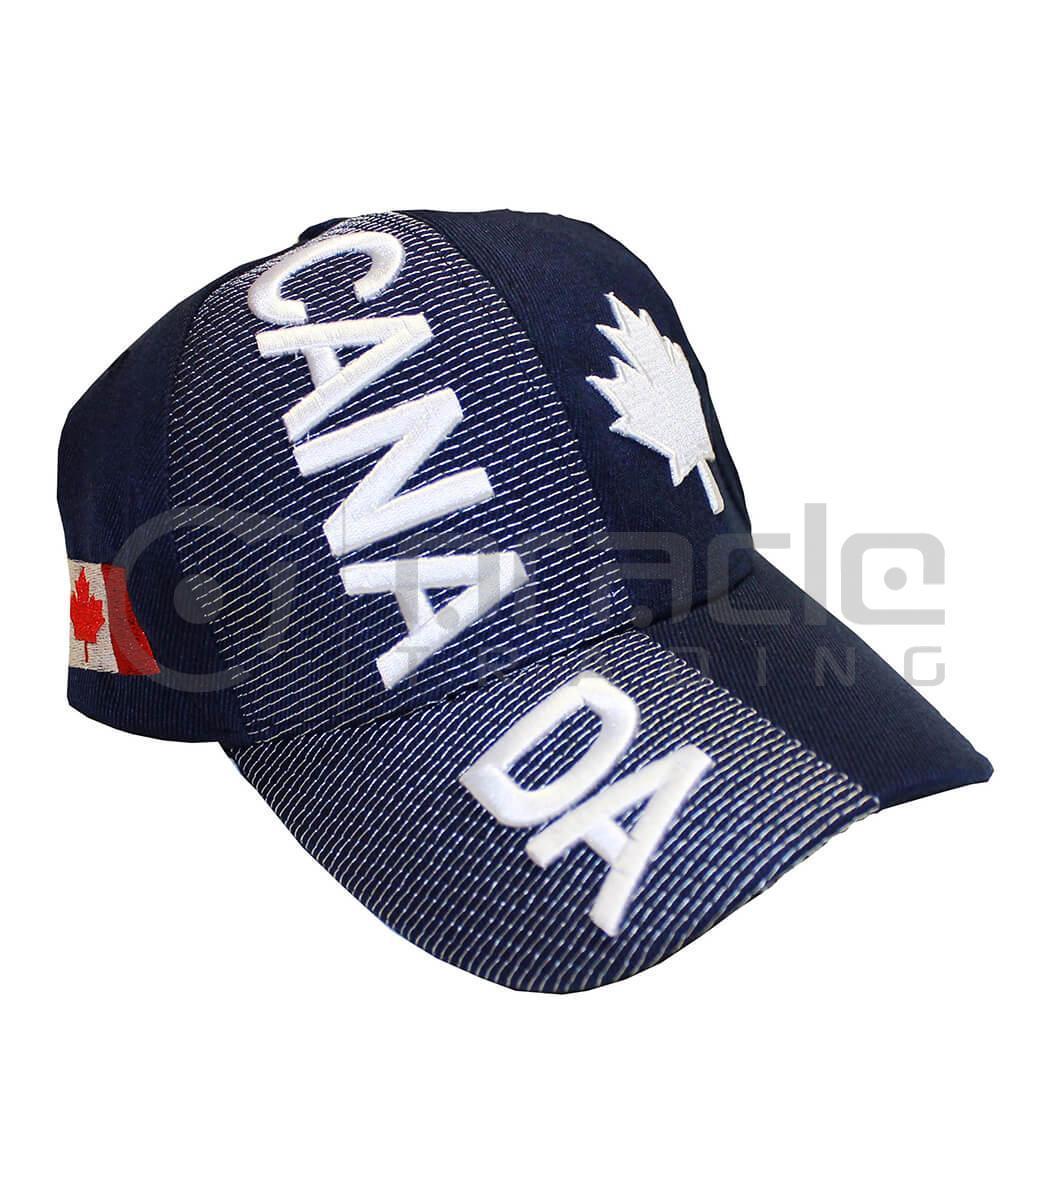 3D Canada Hat - Navy